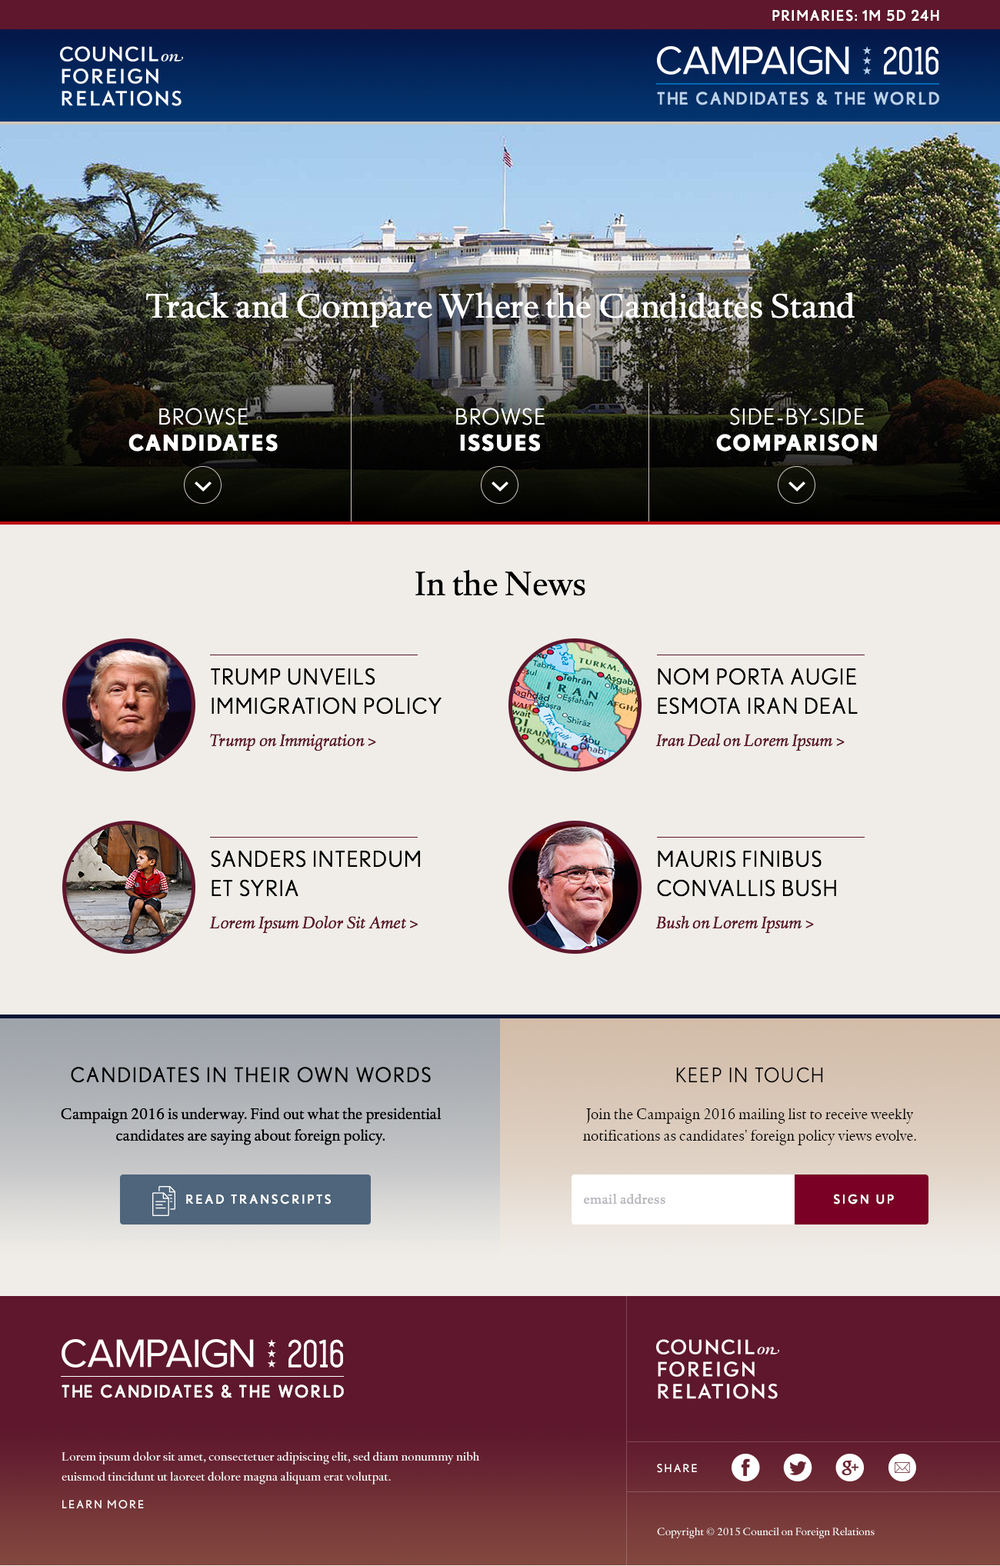 CFR-Campaign-2016-Homepage-Comparison.Final.jpg